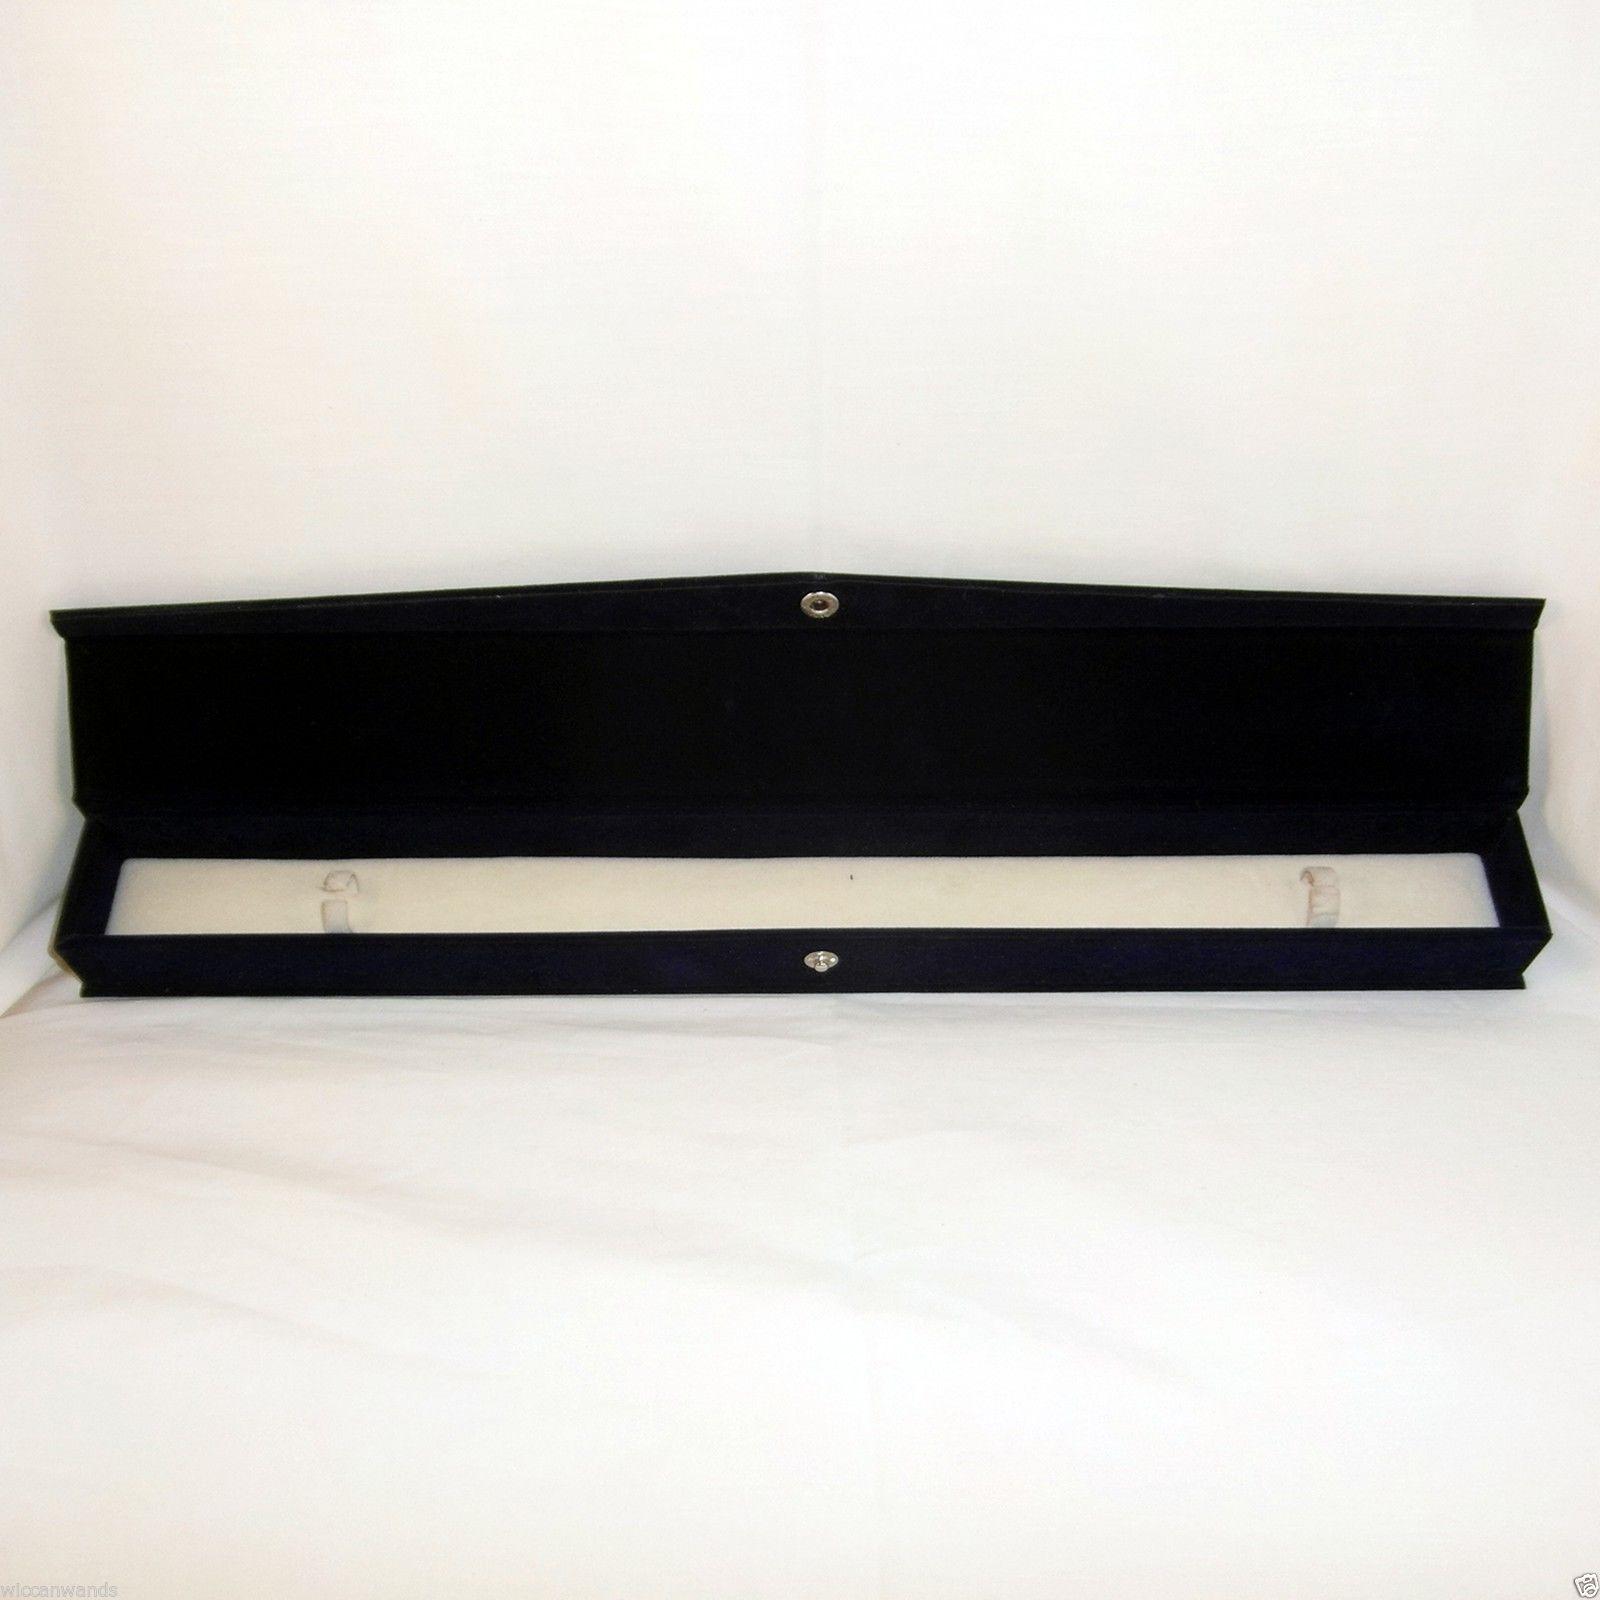 velvet magic wand storage box. Black Bedroom Furniture Sets. Home Design Ideas